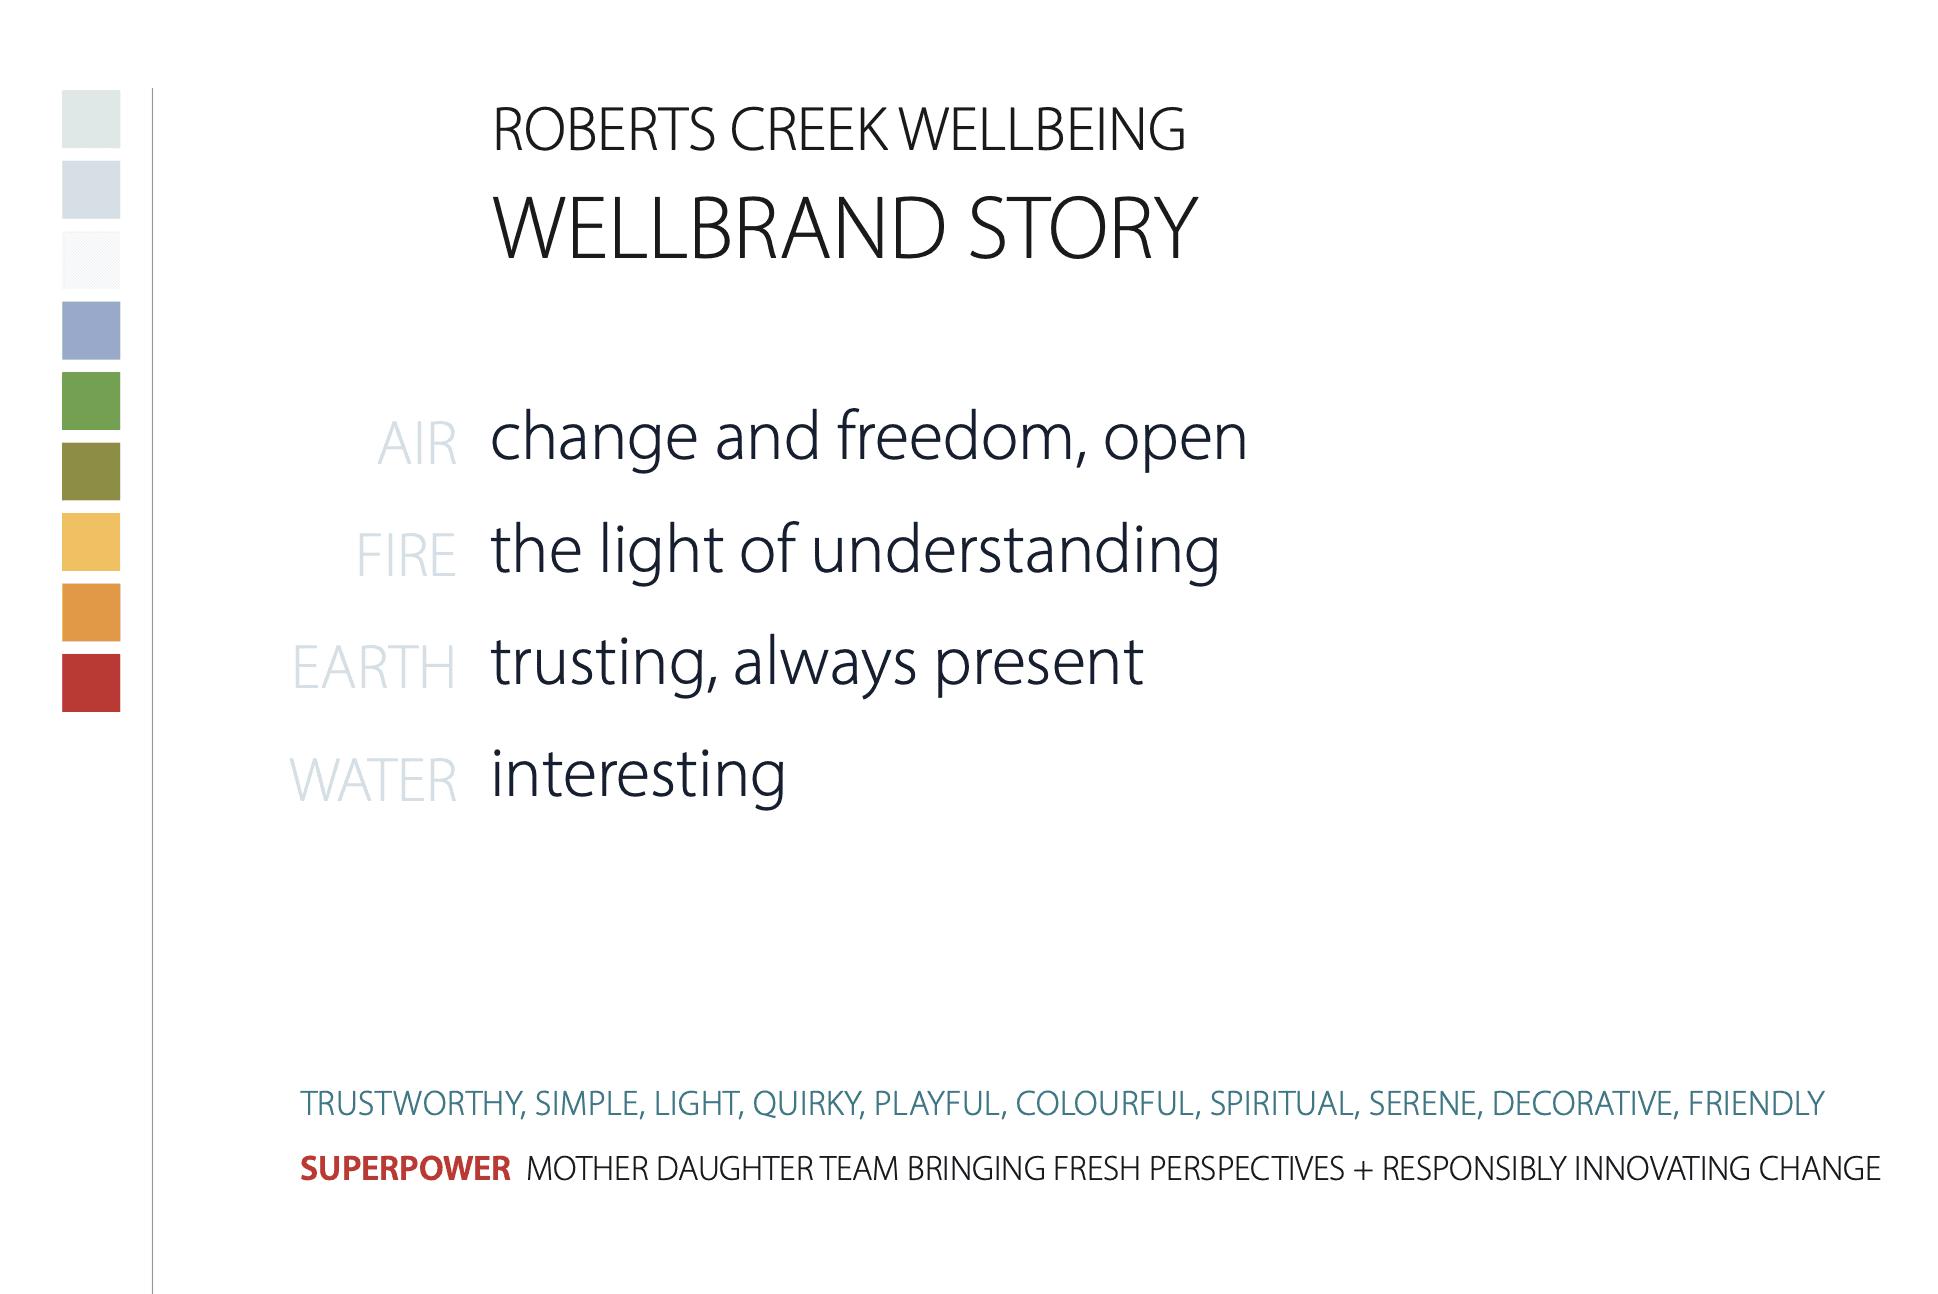 Wellbrand Story